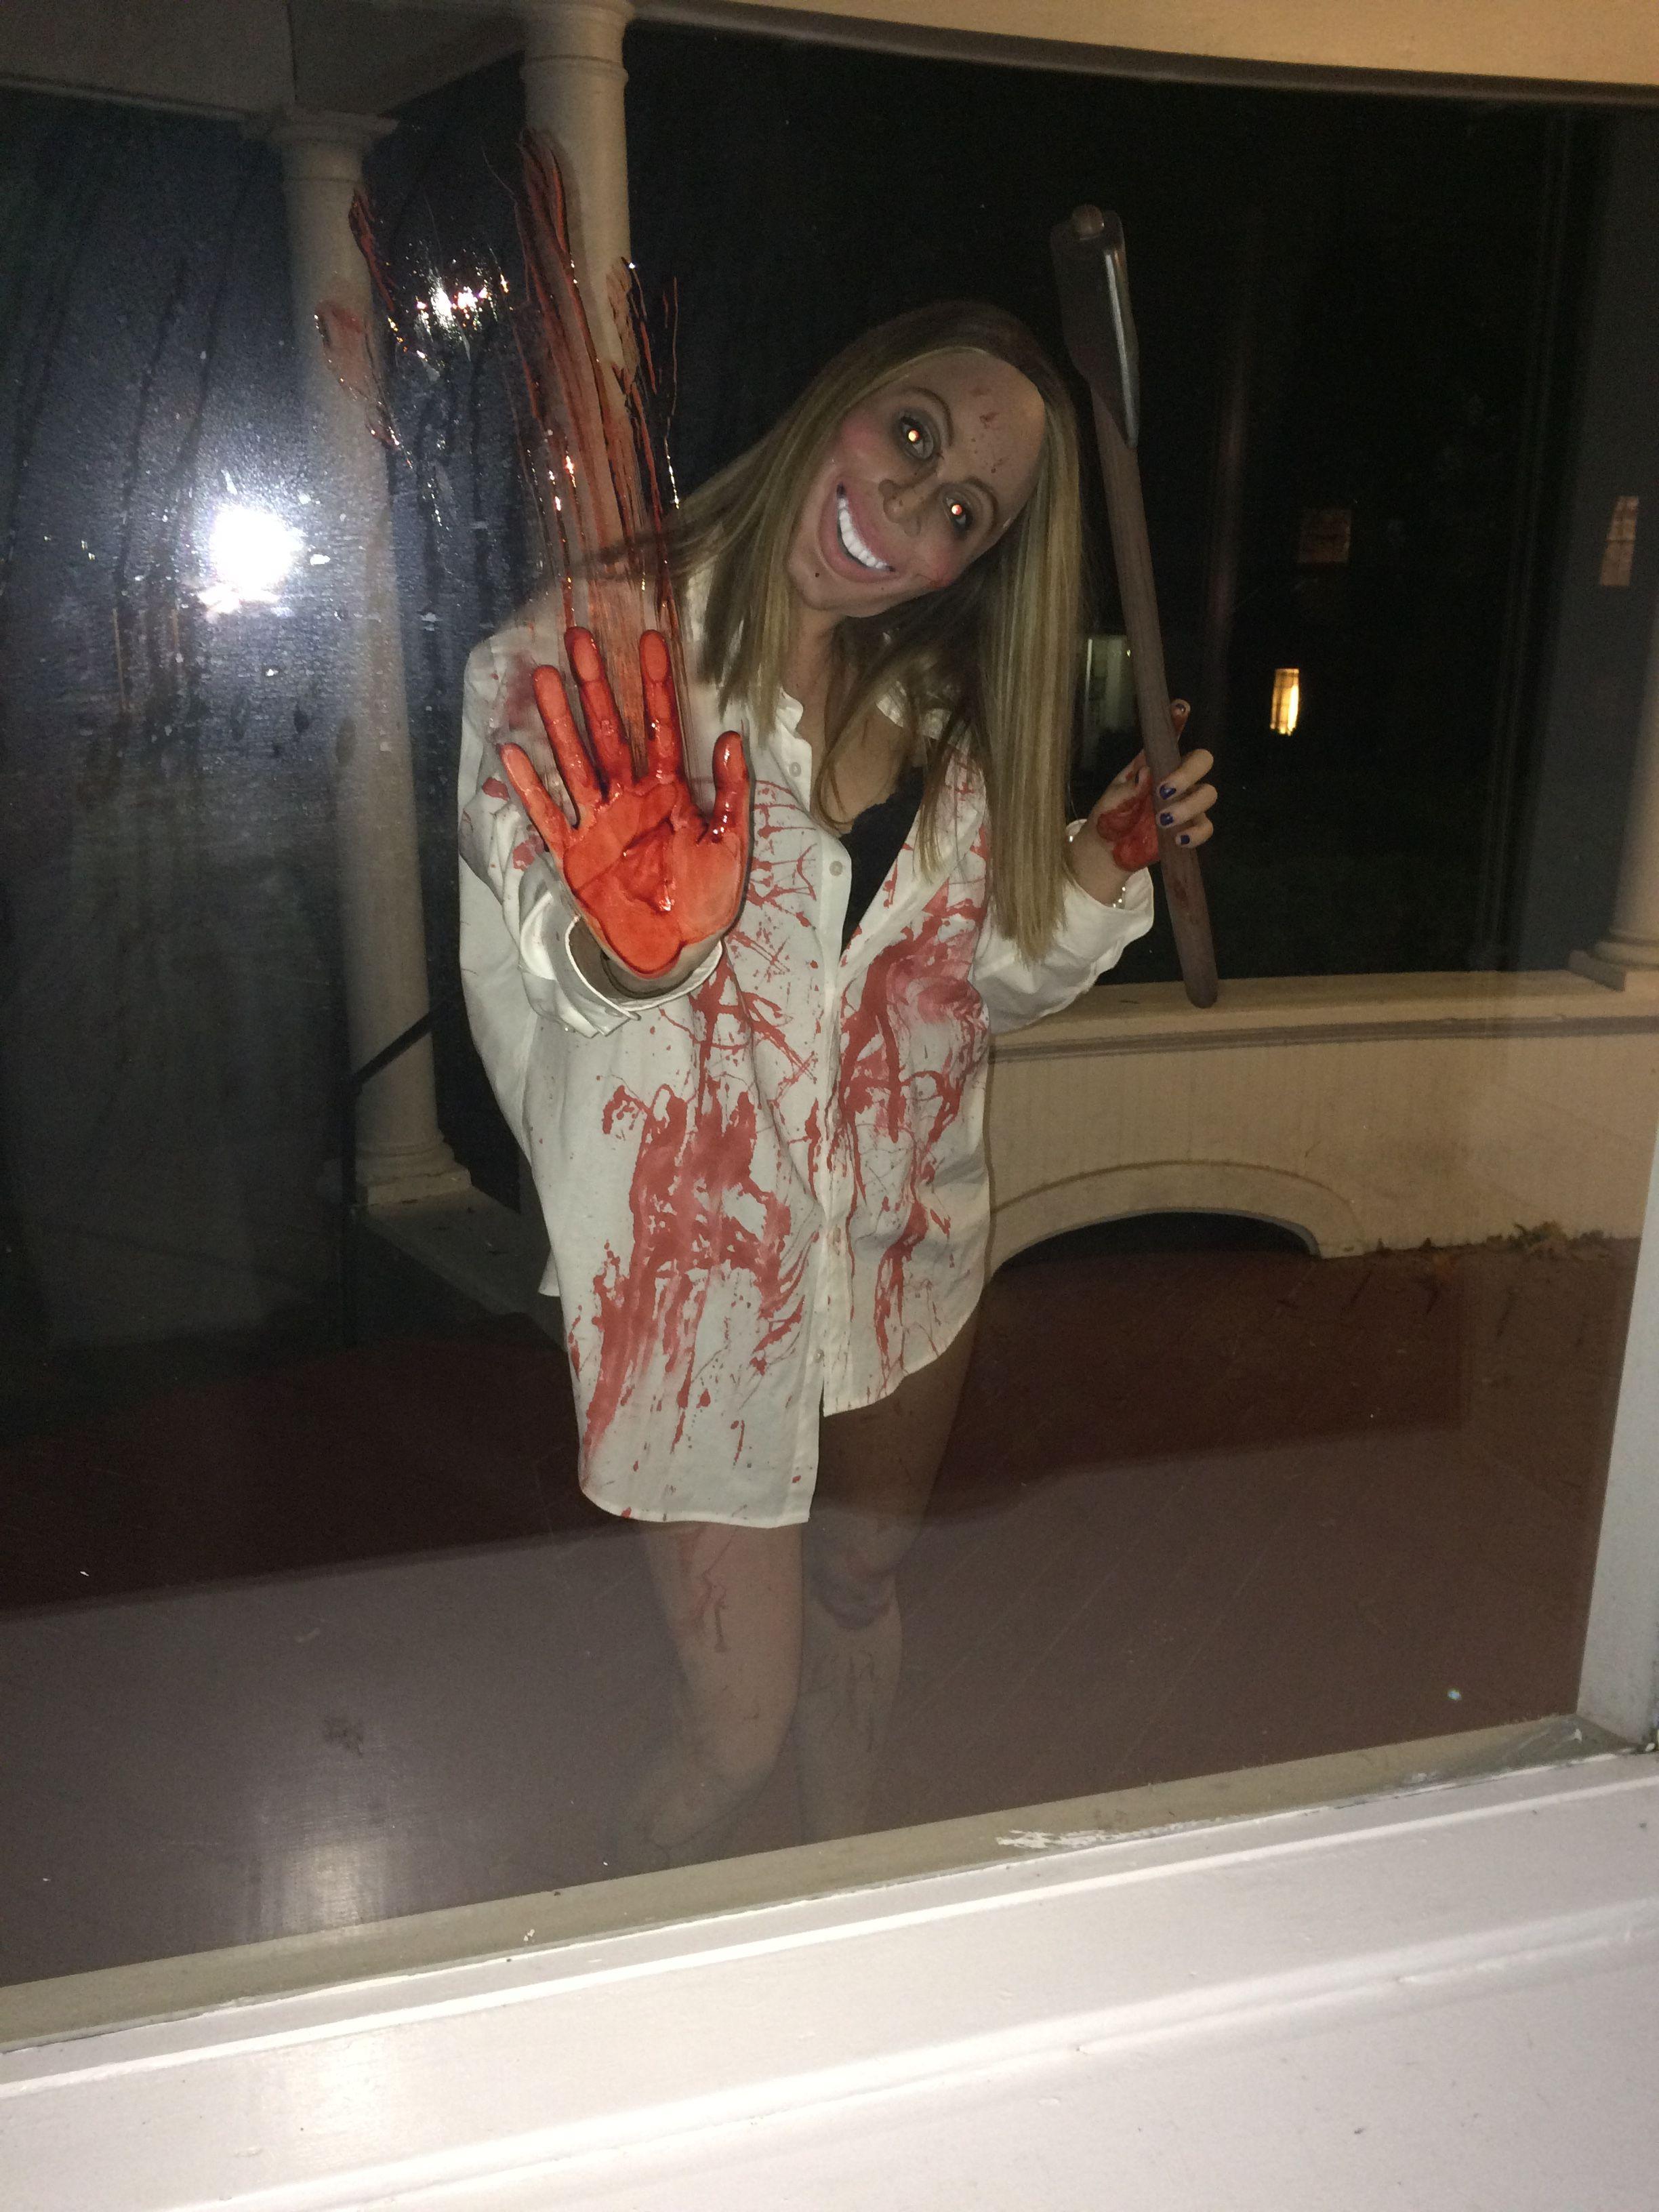 purge halloween costume | Halloween | Pinterest | Halloween ...